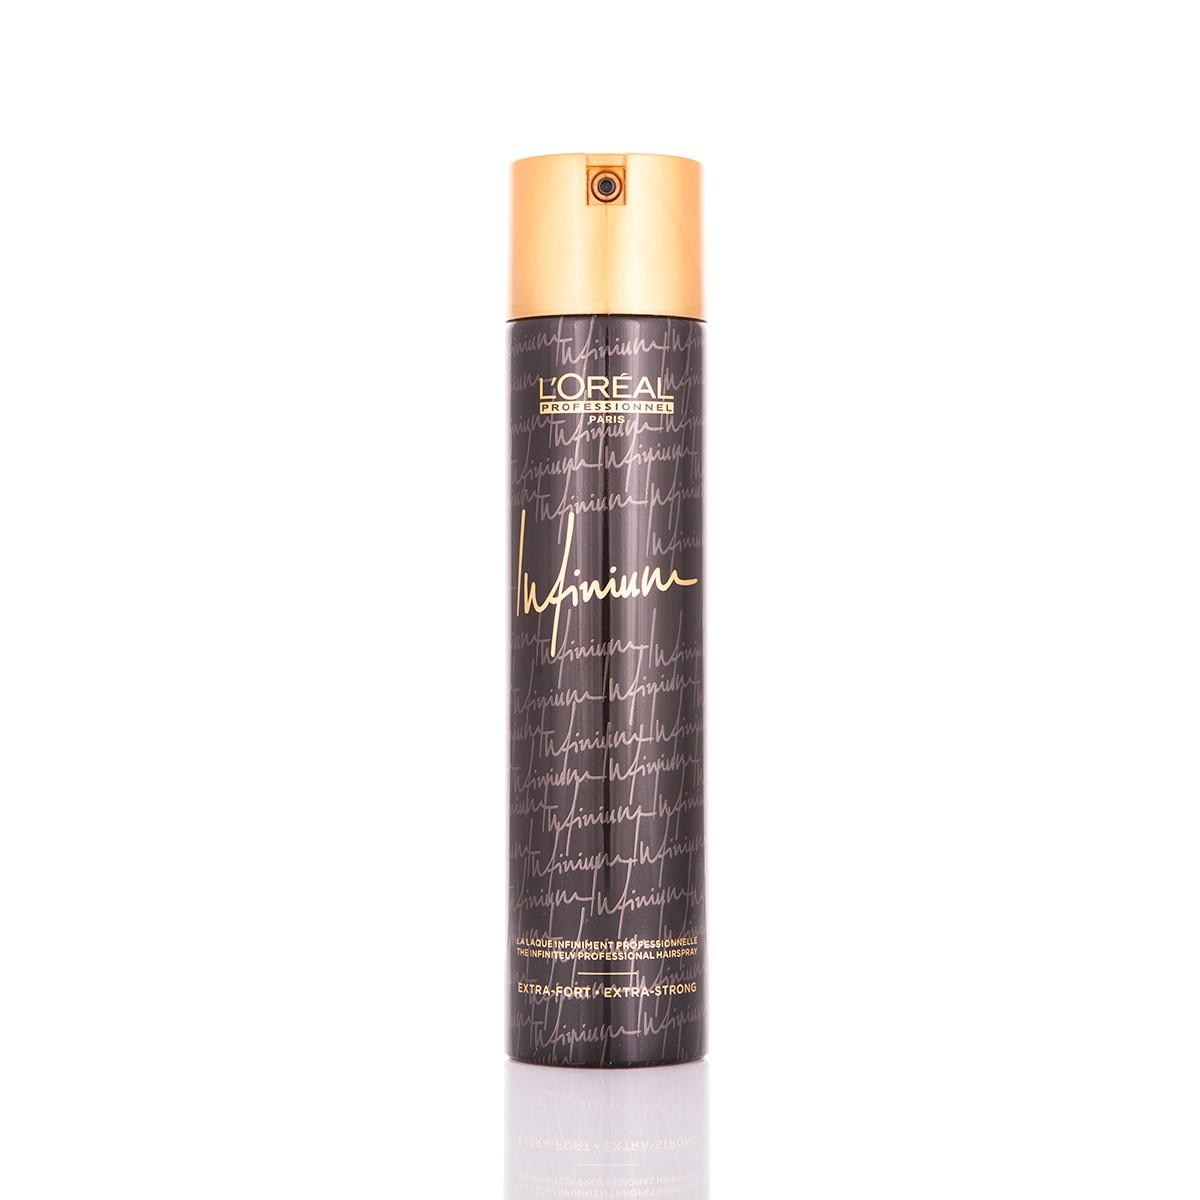 LOREAL Infinium Hairspray Extra Strong 500ml - Lakier do włosów